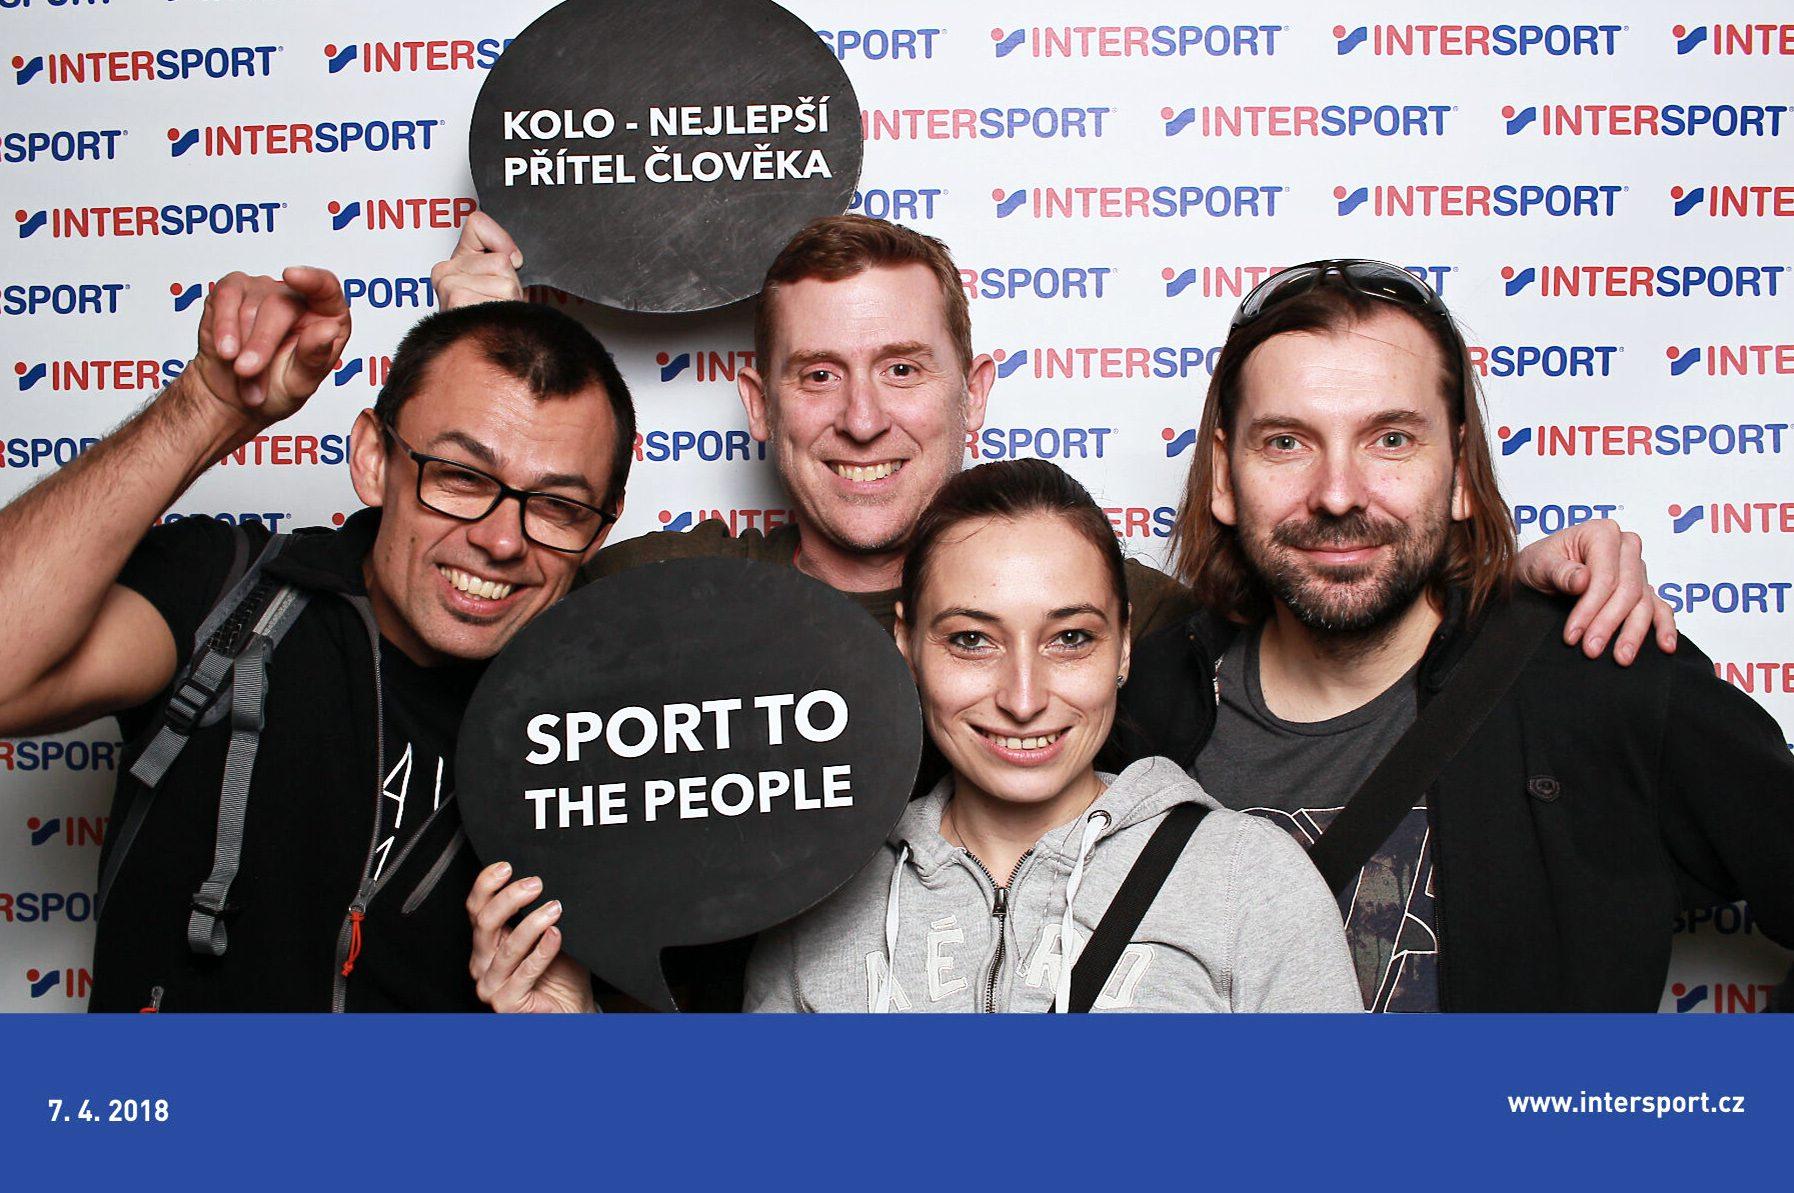 fotokoutek-intersport-for-bikes-pva-letnany-7-4-2018-405725